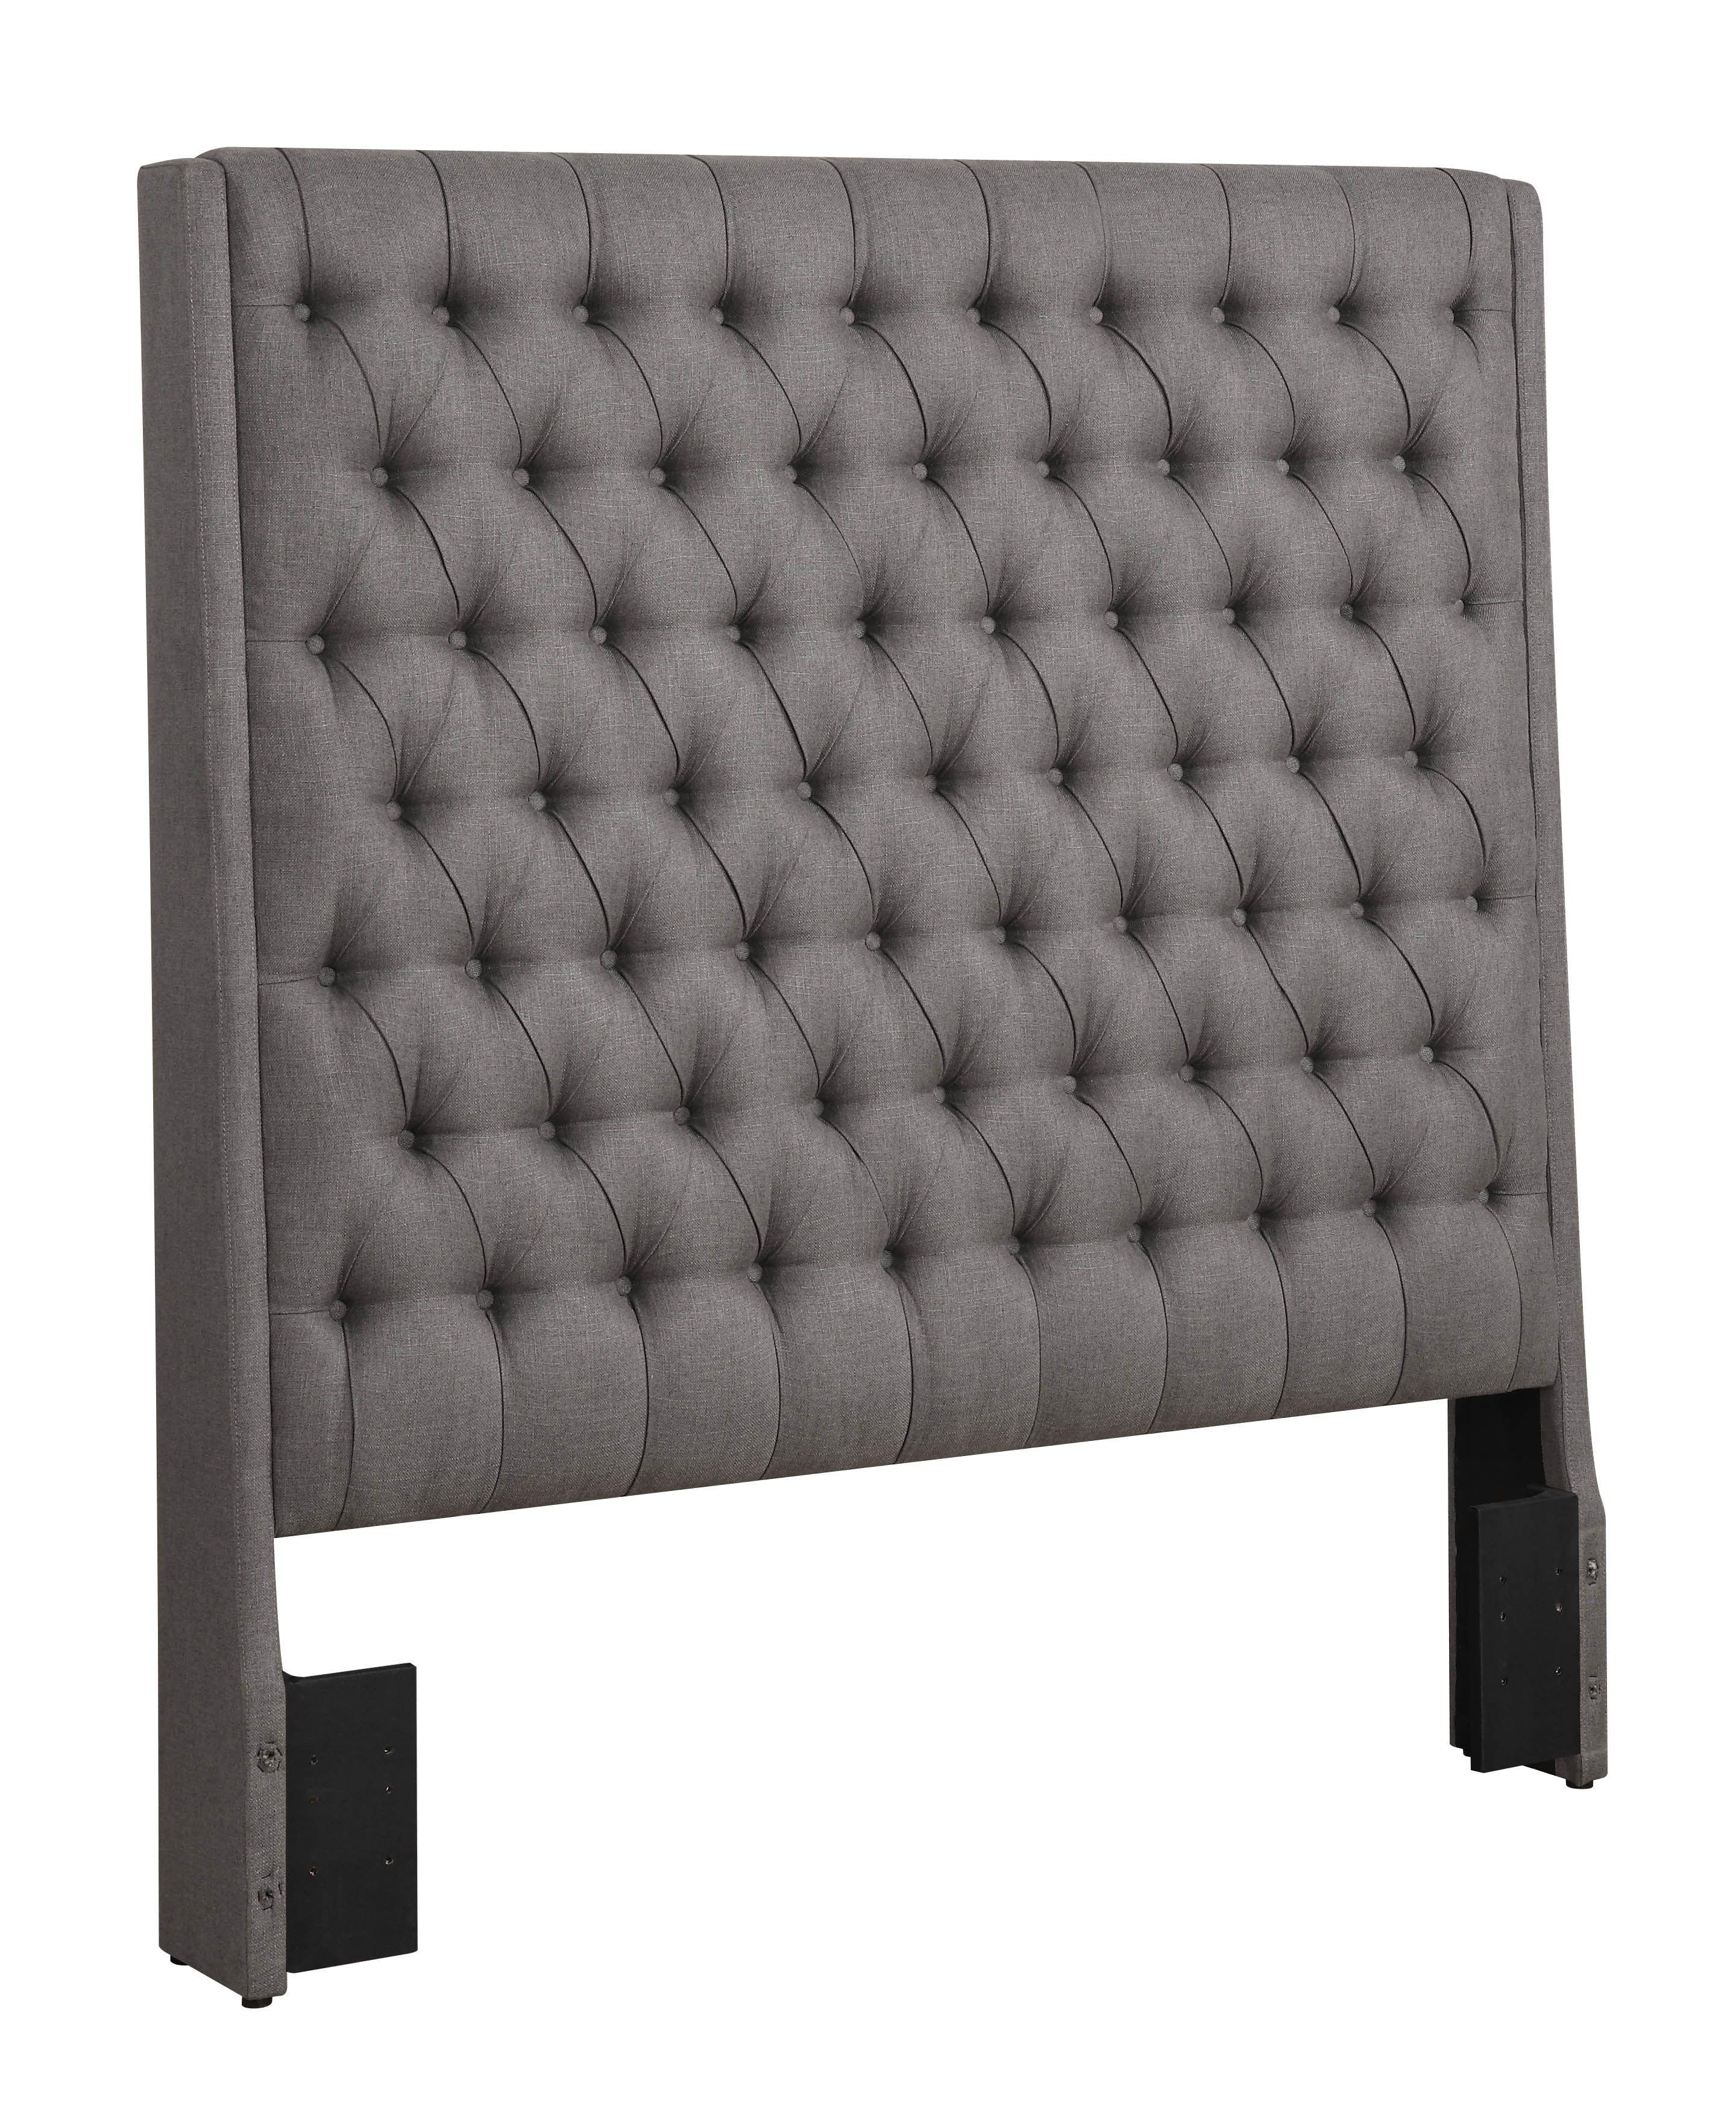 King Modern Ultra Tall Headboard in Tufted Soft Grey Fabric